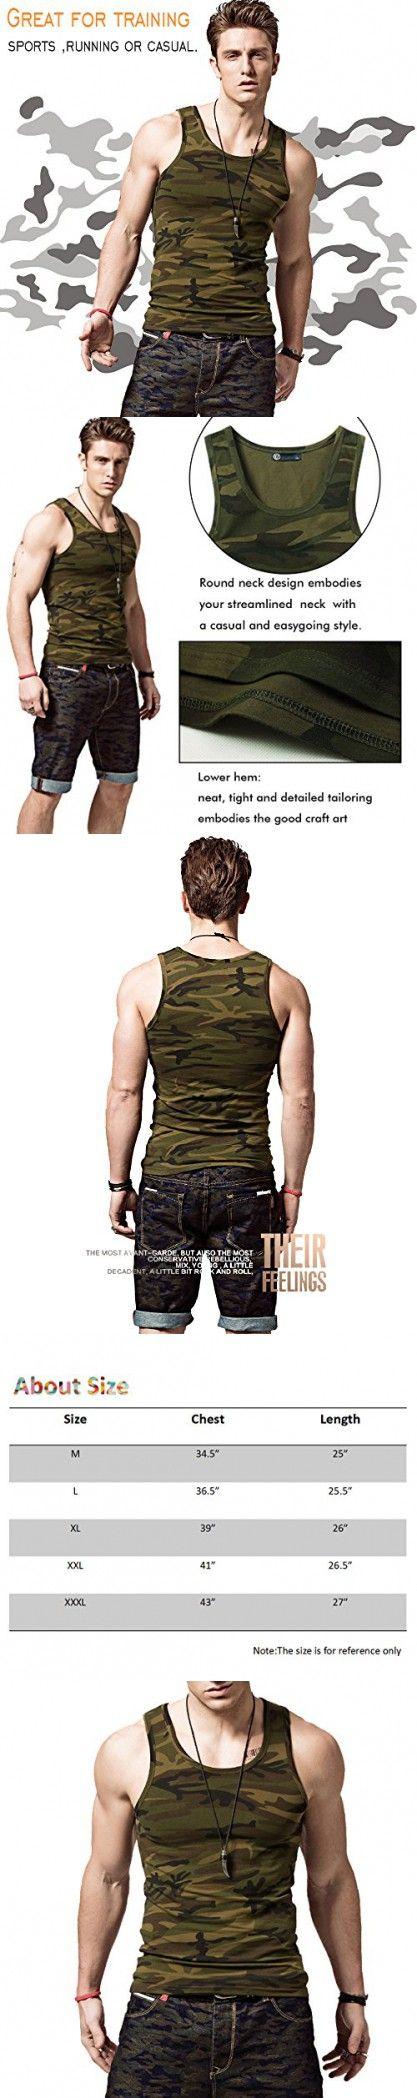 XShing Cotton Men Tank Top Comfort-Soft Gym Men's Sleeveless Muscle Camo shirts (XXXL, ArmyGreen)